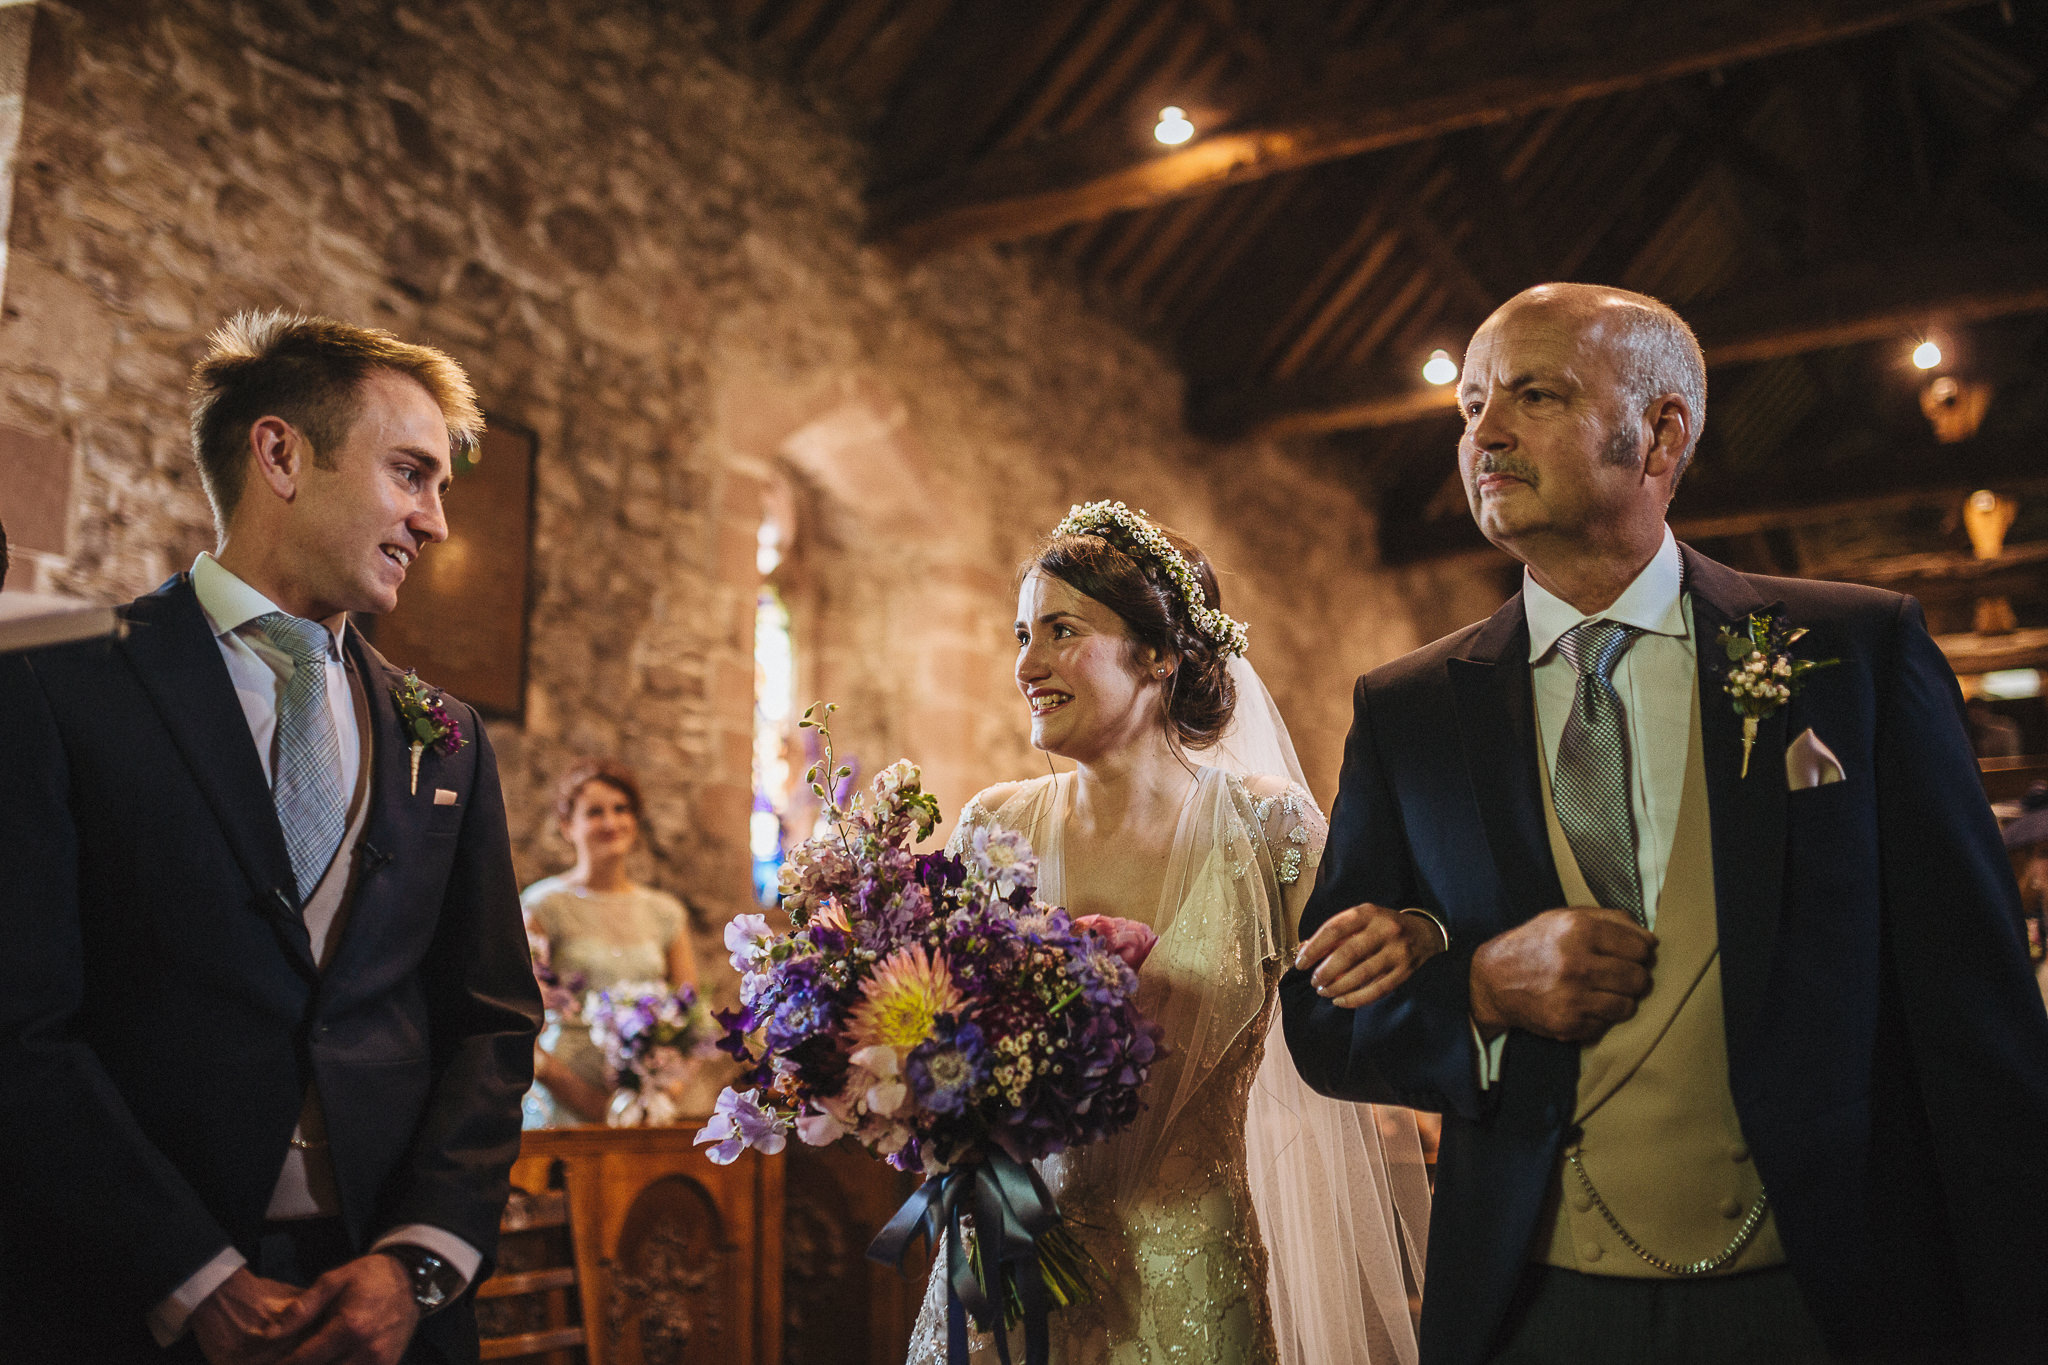 paul-marbrook-Farm-Wedding-Photographer-Lancashire-90027